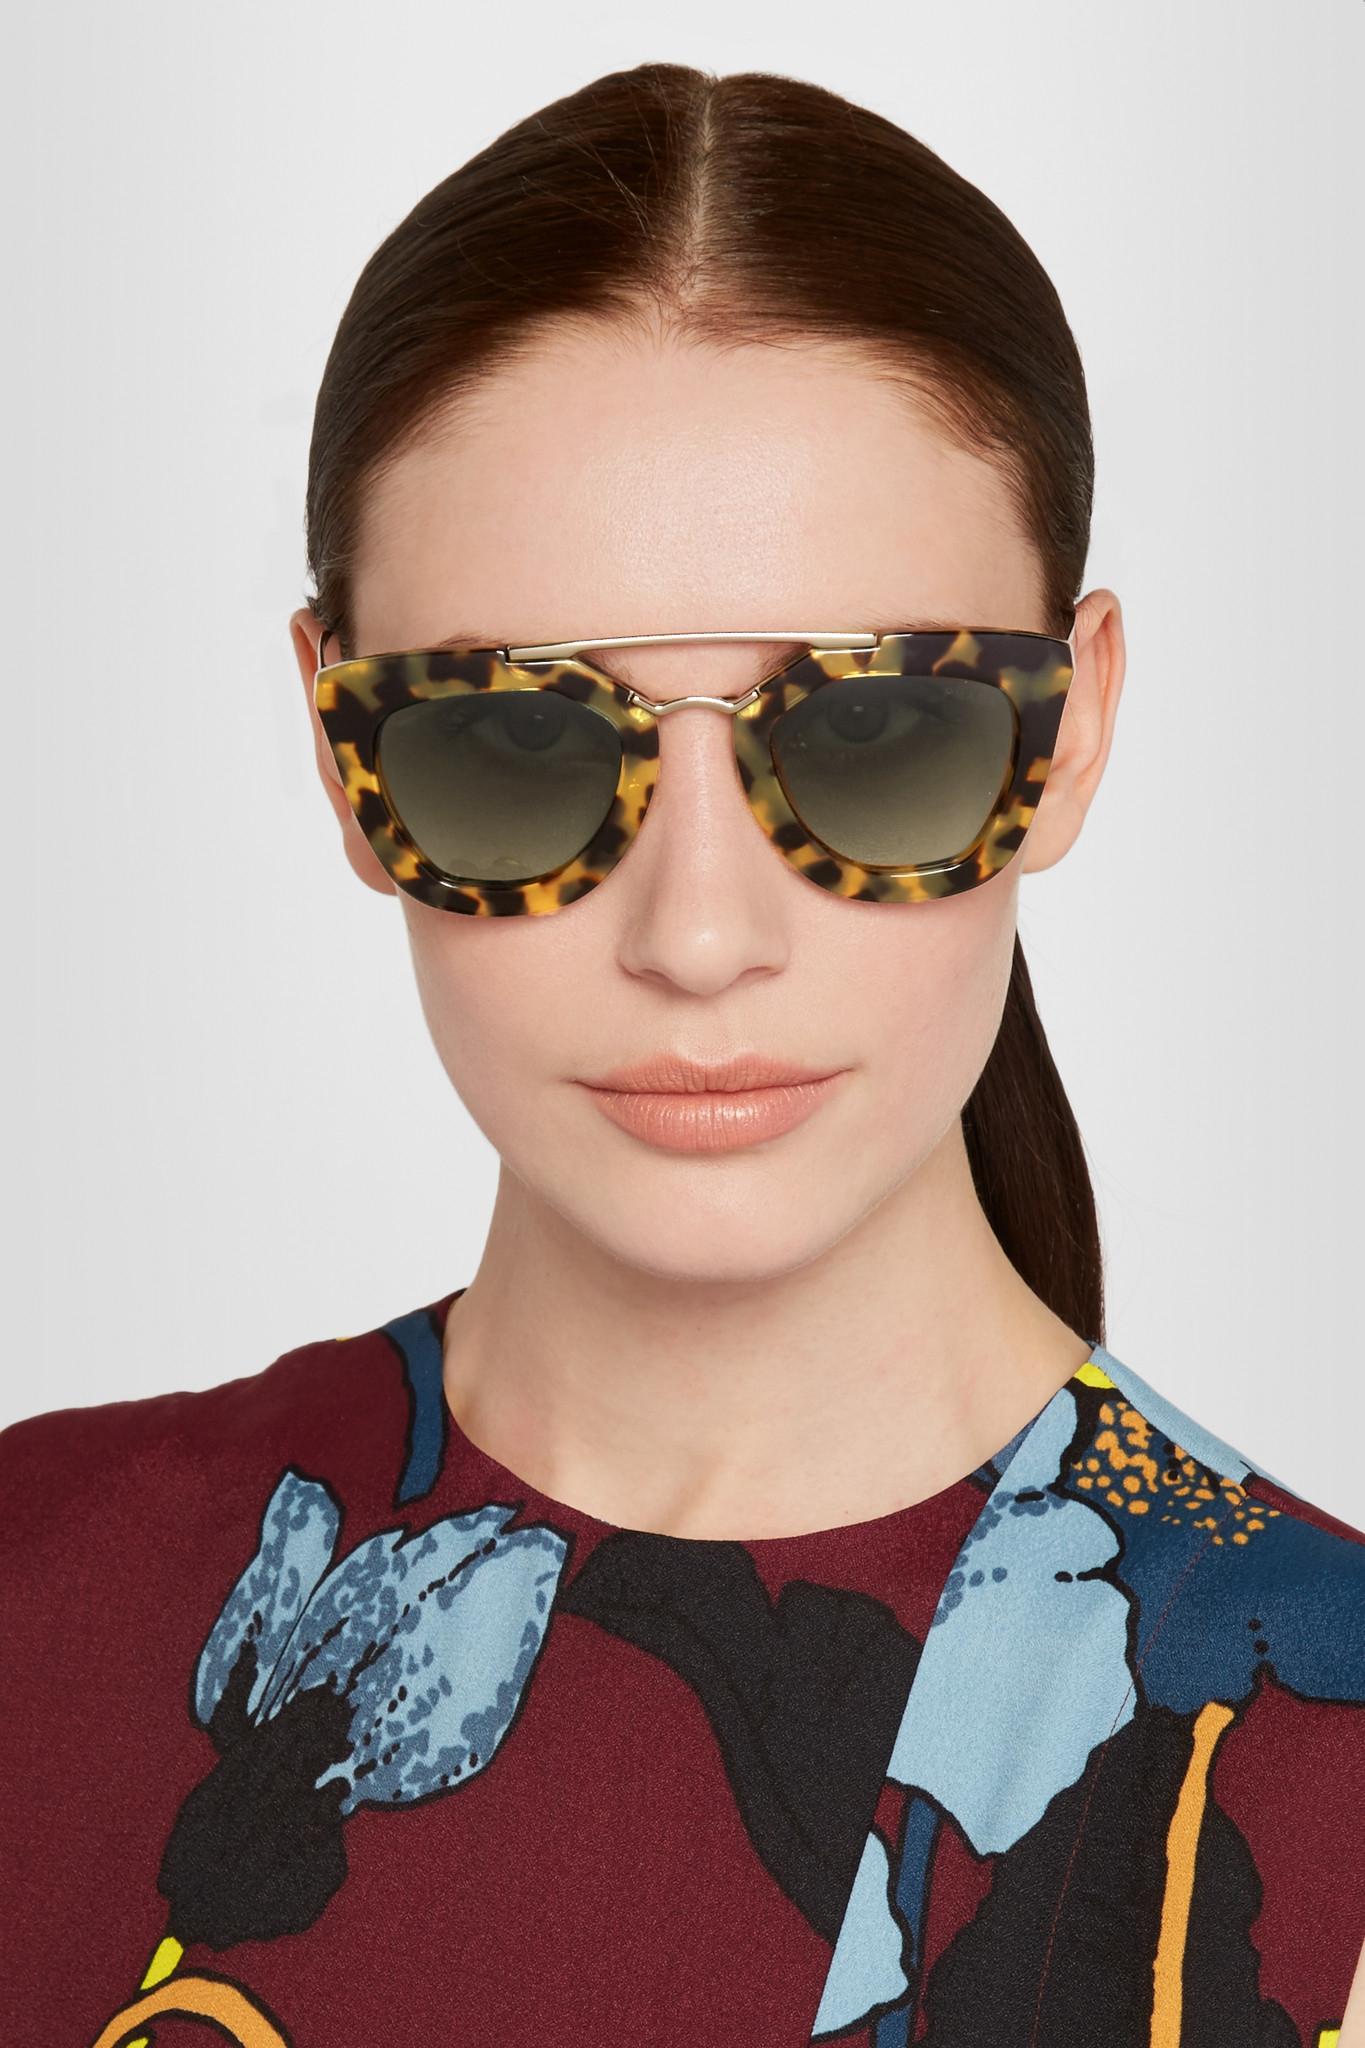 bf8b6fb043c order prada eyewear oversized round frame sunglasses 00673 474b8  hot prada  d frame acetate and gold tone sunglasses in brown lyst bf6e0 830de